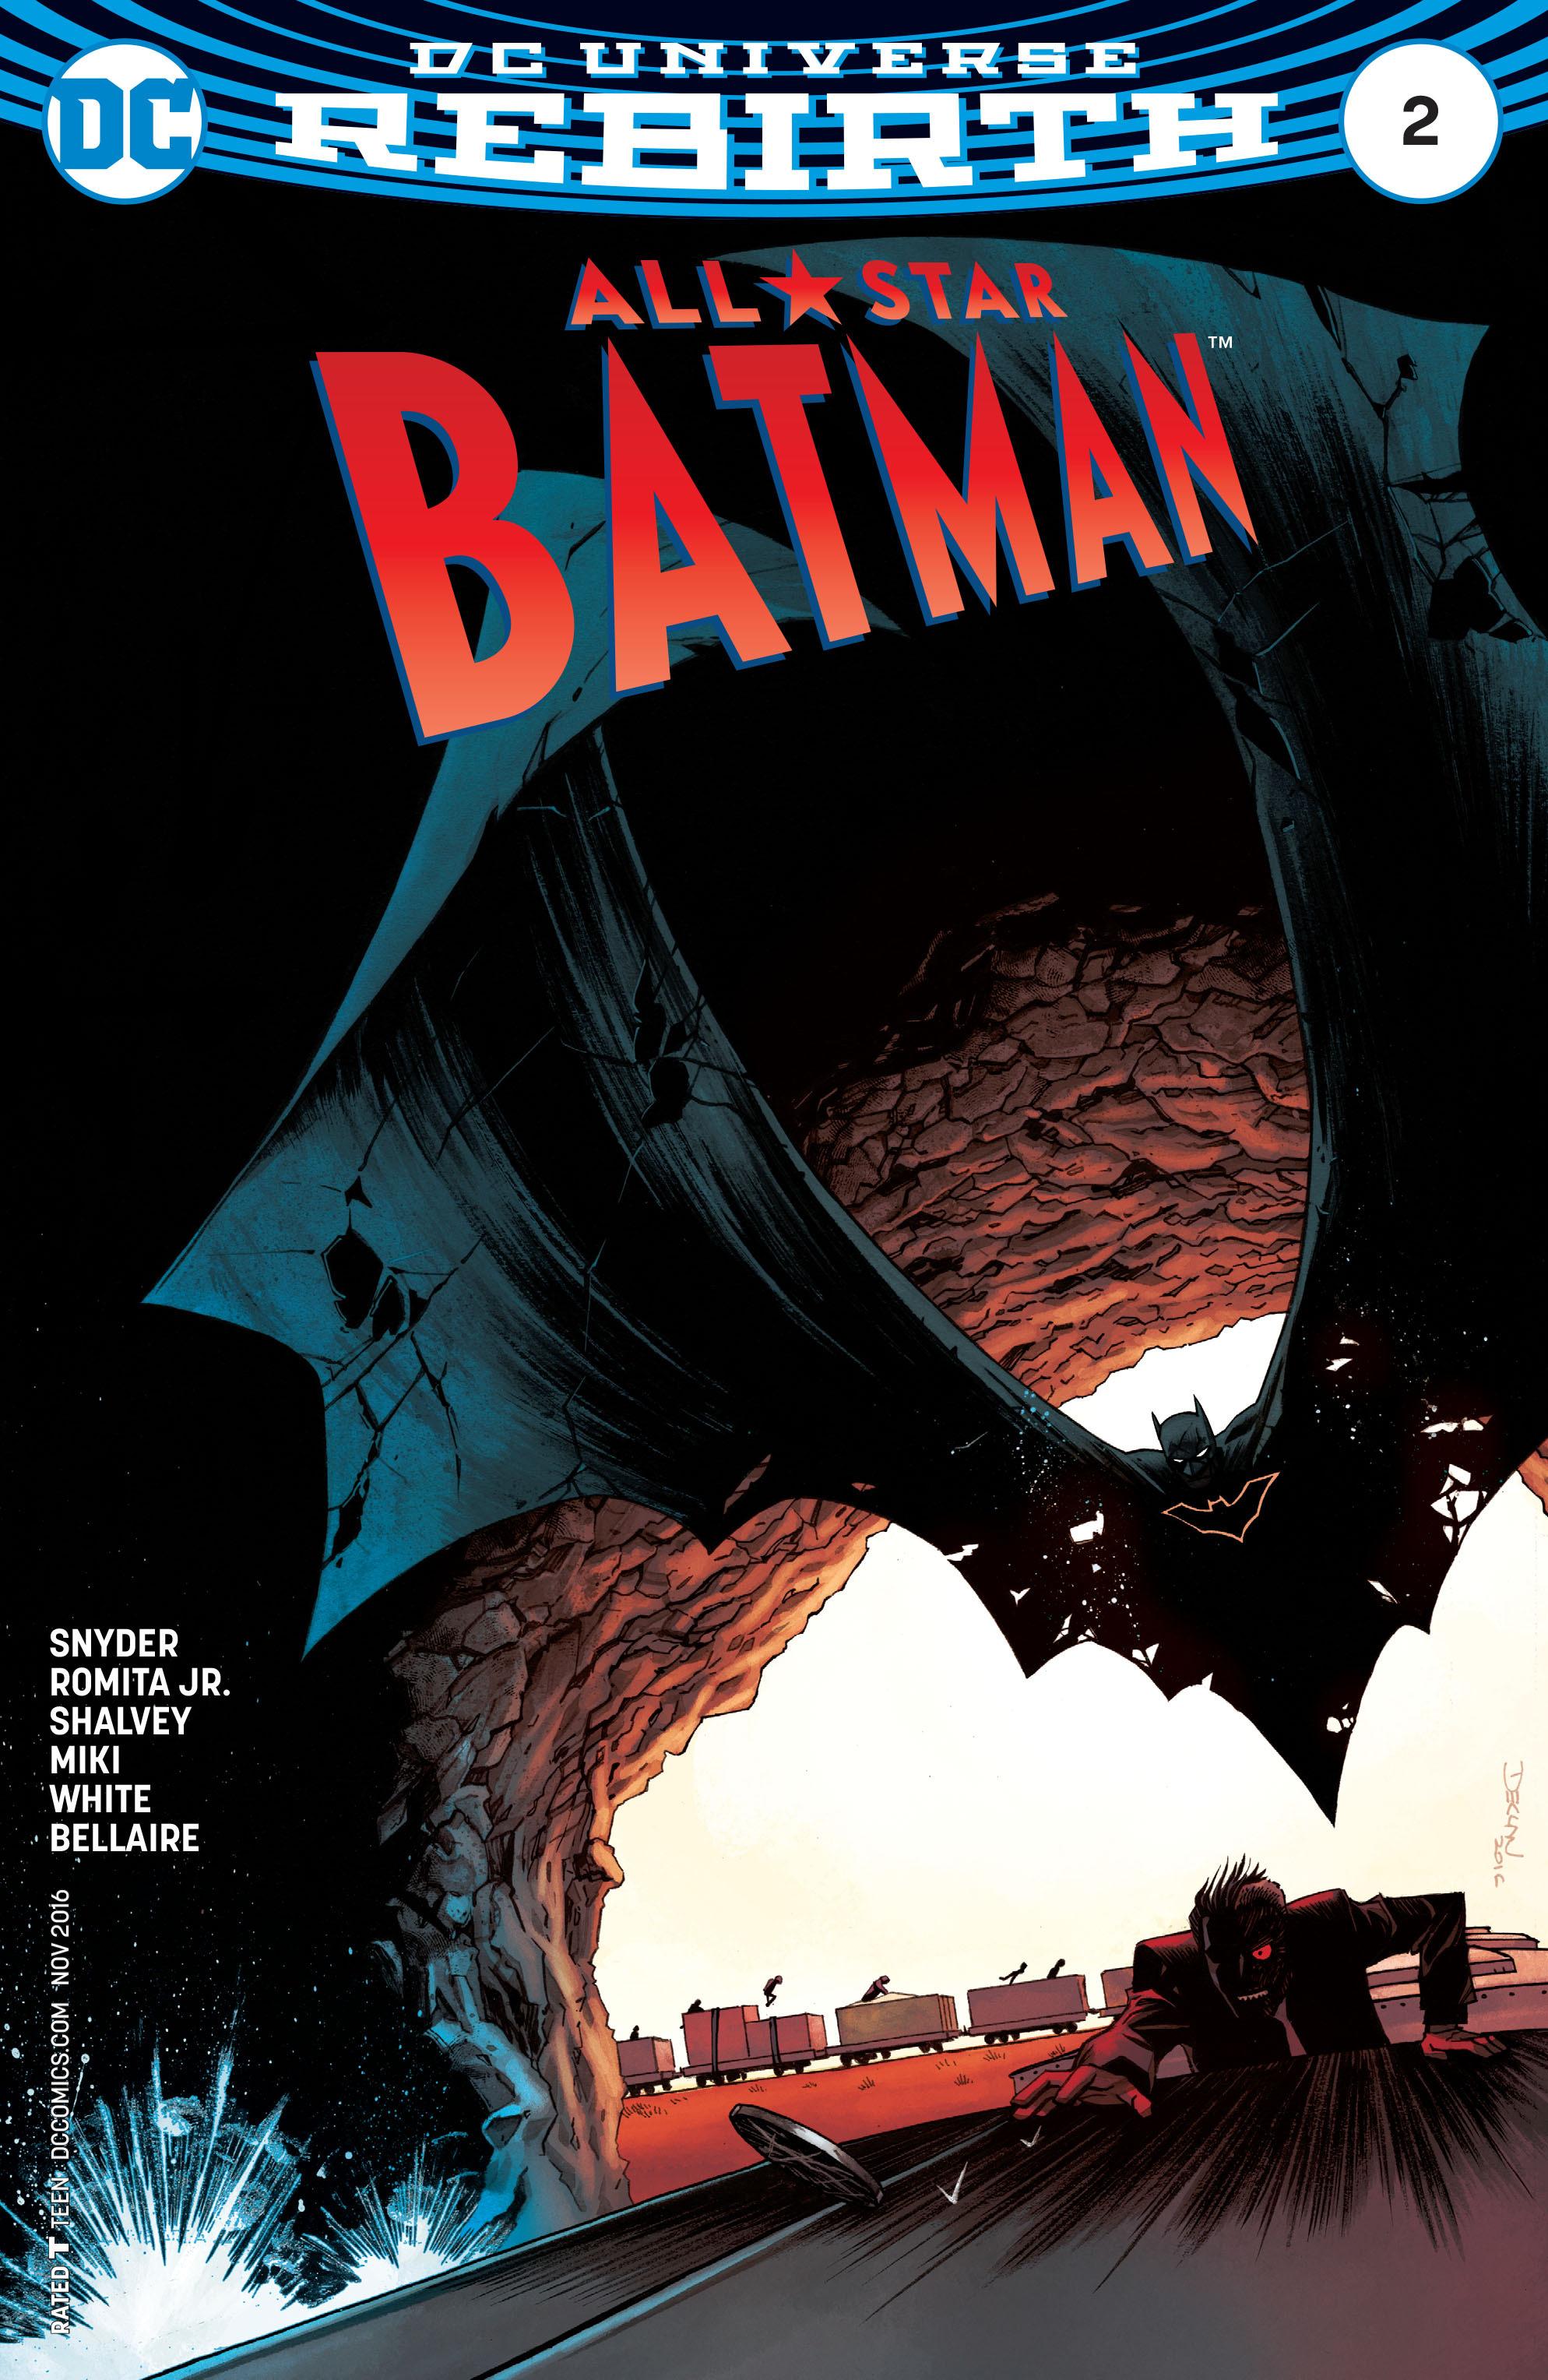 Read online All-Star Batman comic -  Issue #2 - 3